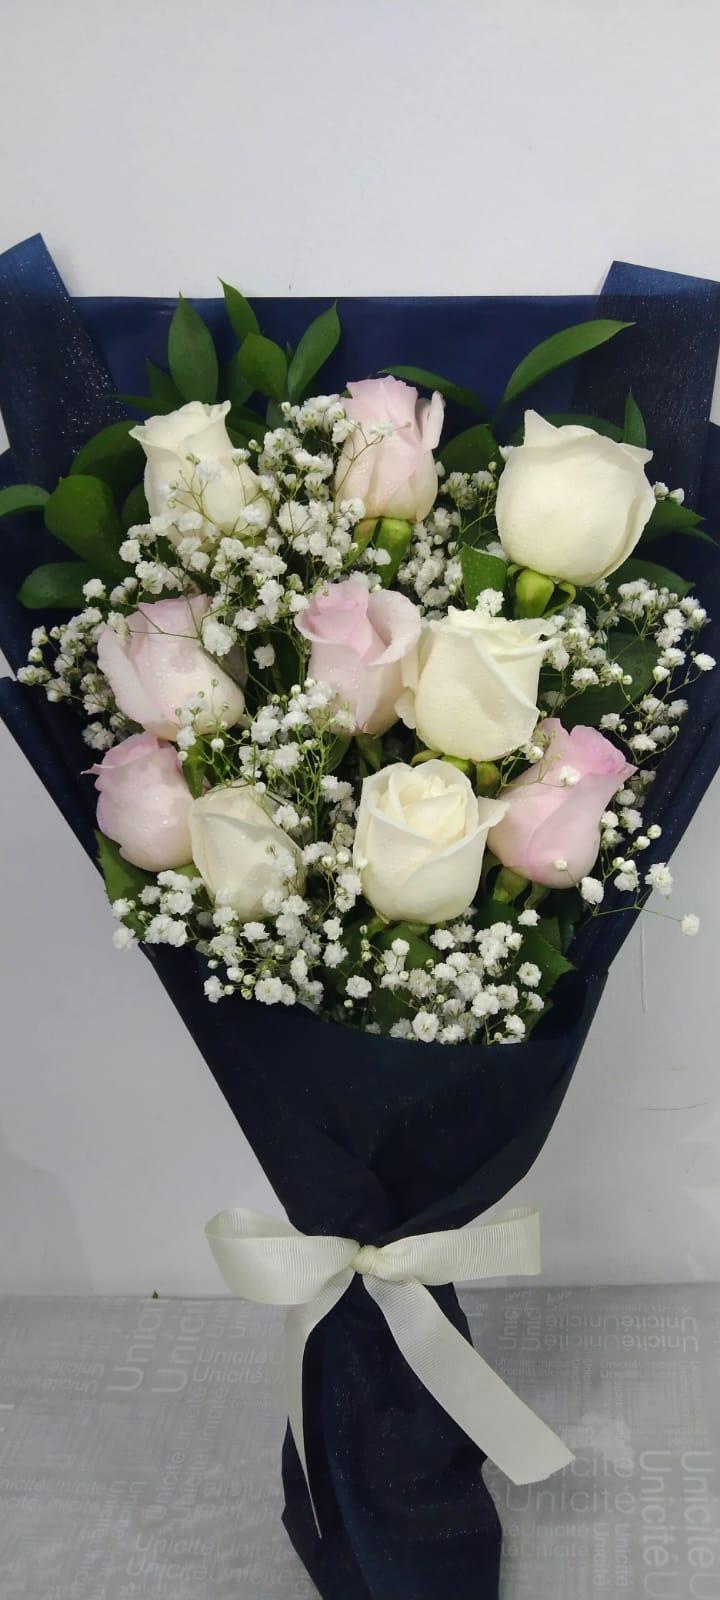 Flower Arrangement Delivery